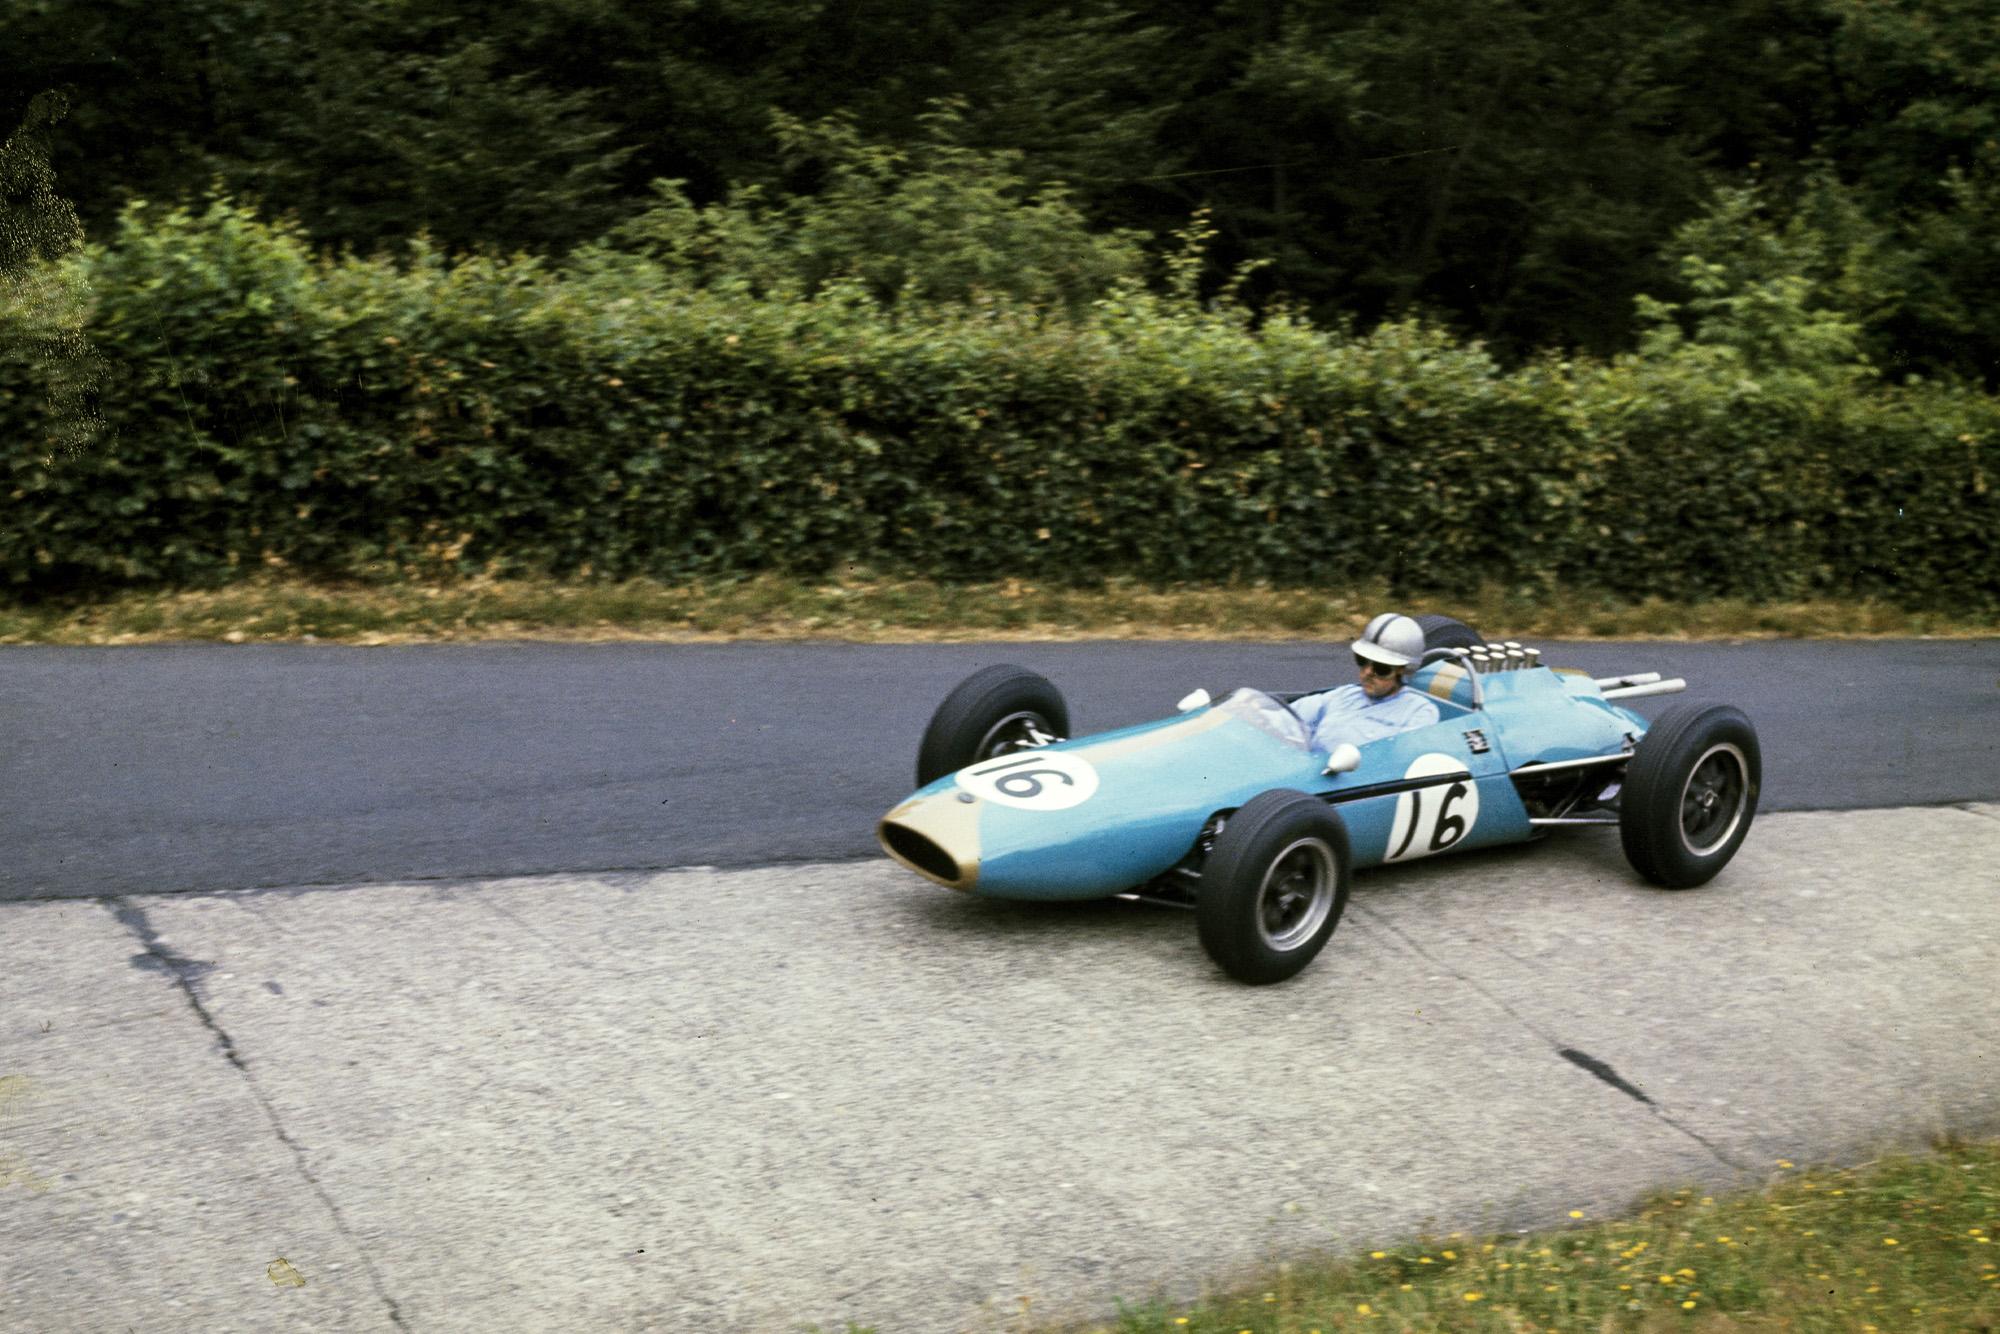 Brabham entered his new Brabham BT3 Climax